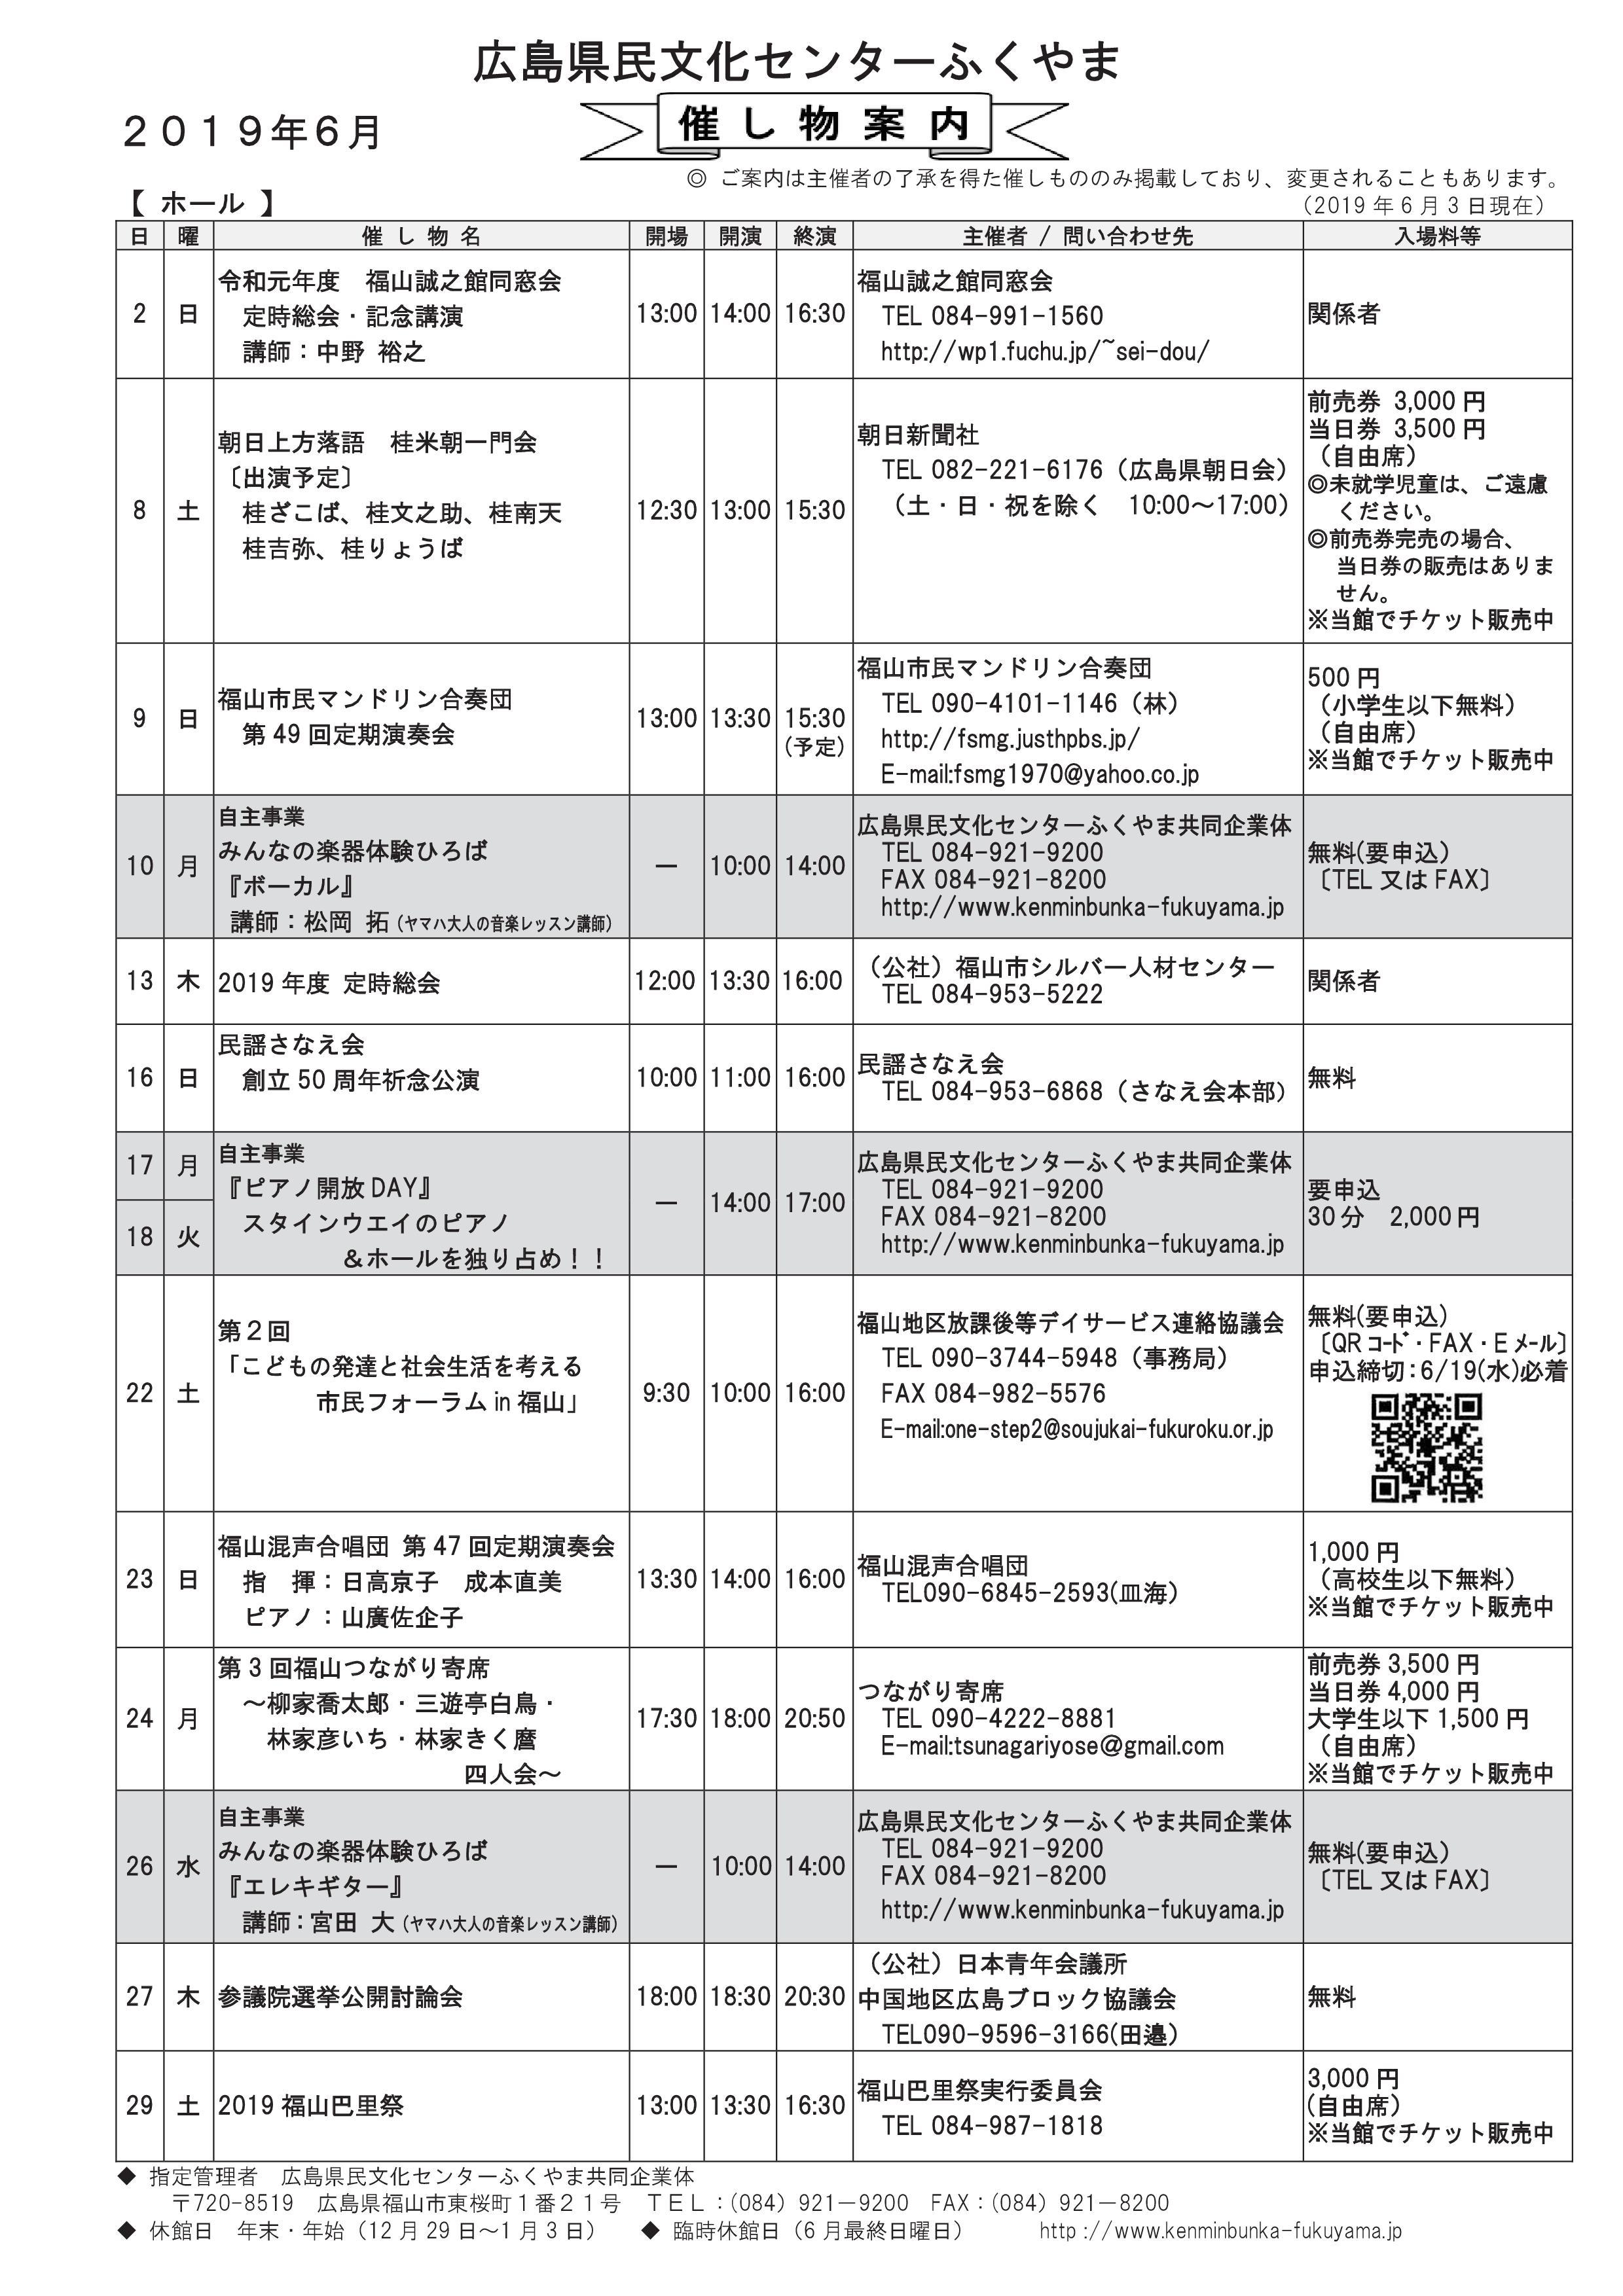 催し物案内6月追加(6.3改).